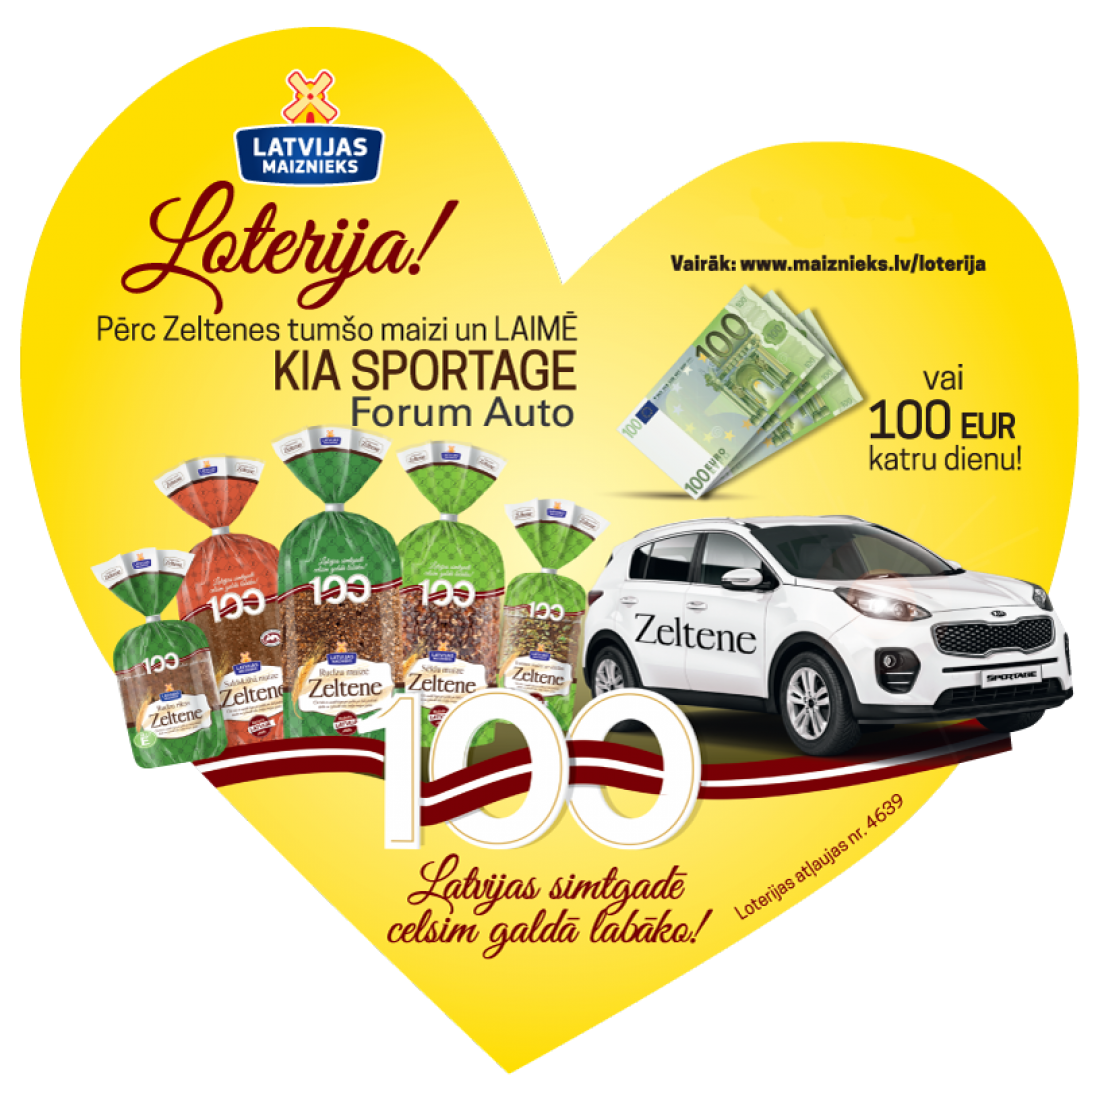 Zeltene лотерея празднуя 100-летие Латвии